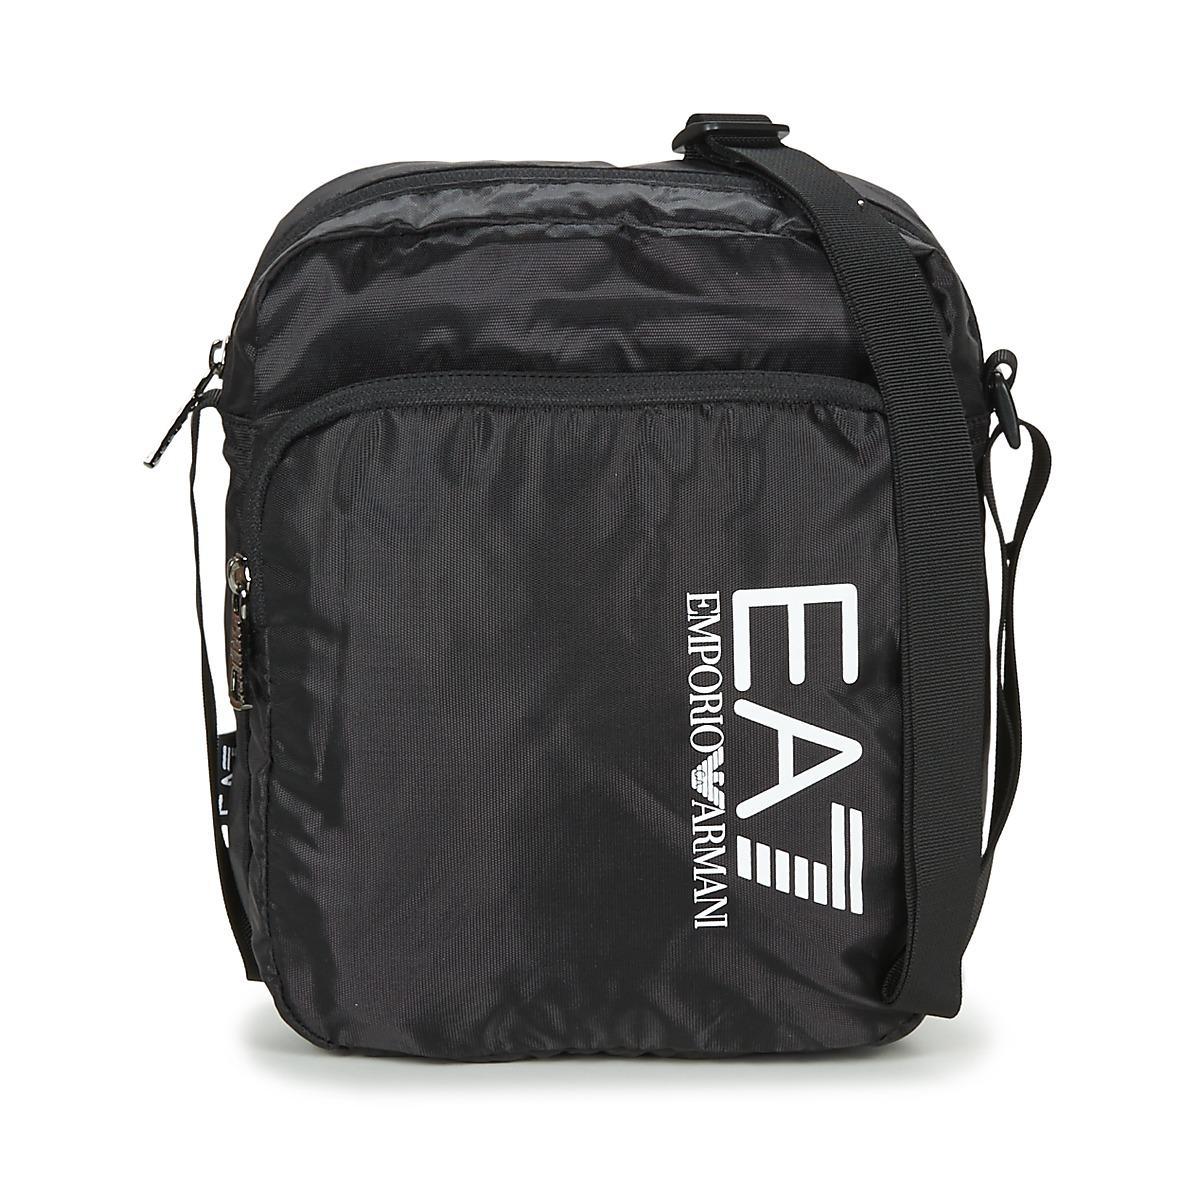 EA7 Train Prime U Pouch Bag Large B Men s Pouch In Black in Black ... 07772012ec4a1